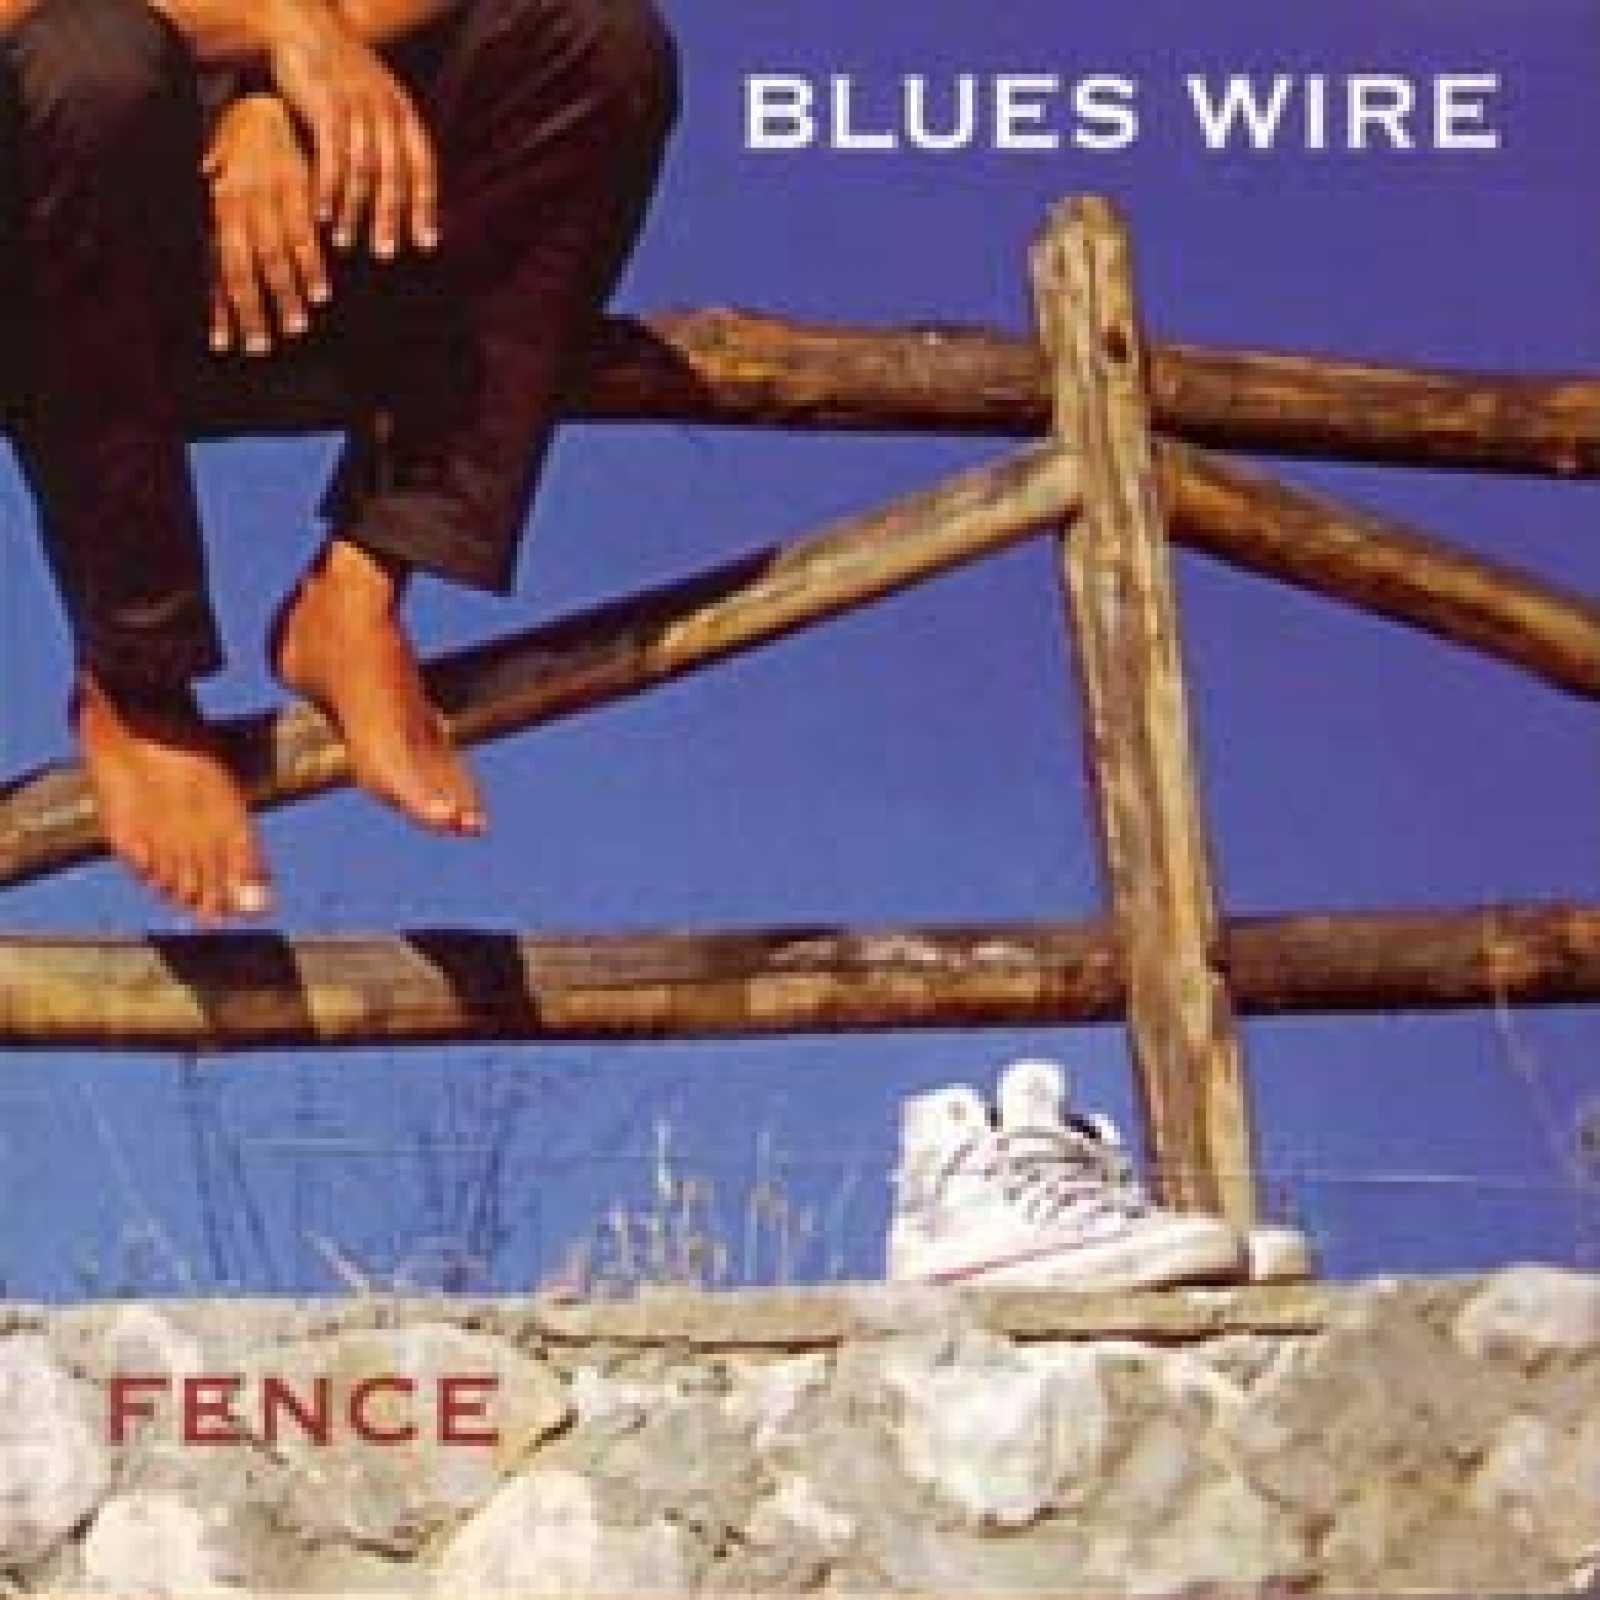 FENCE (2001)